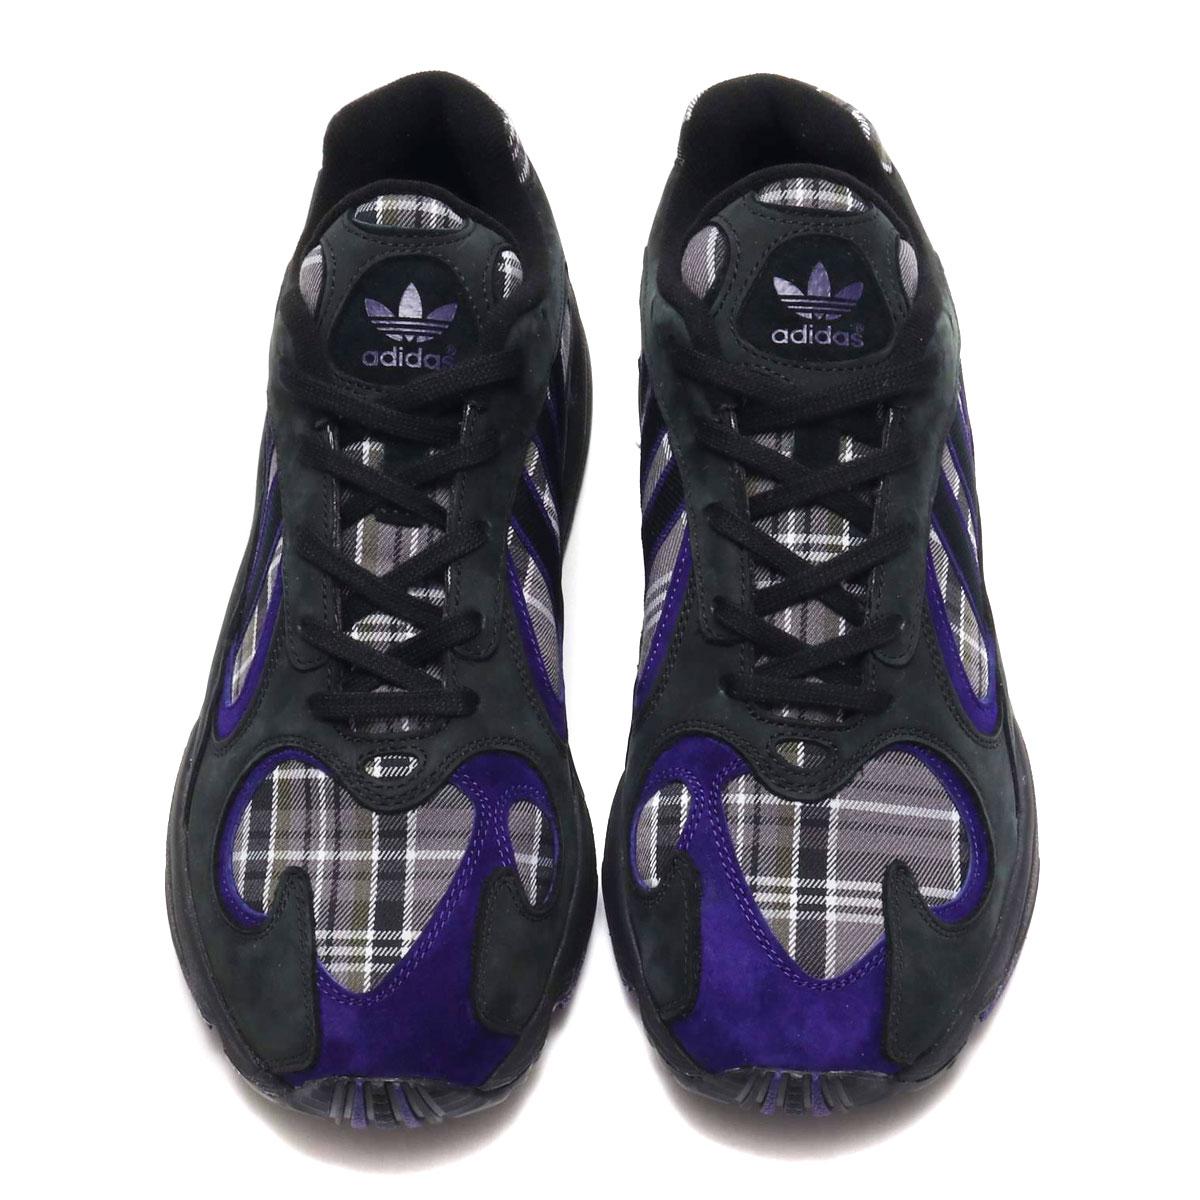 adidas Originals YUNG-1 (CORE BLACK COLLEGE PURPLE CORE BLACK) (Adidas  originals young people -1) e3b231f93